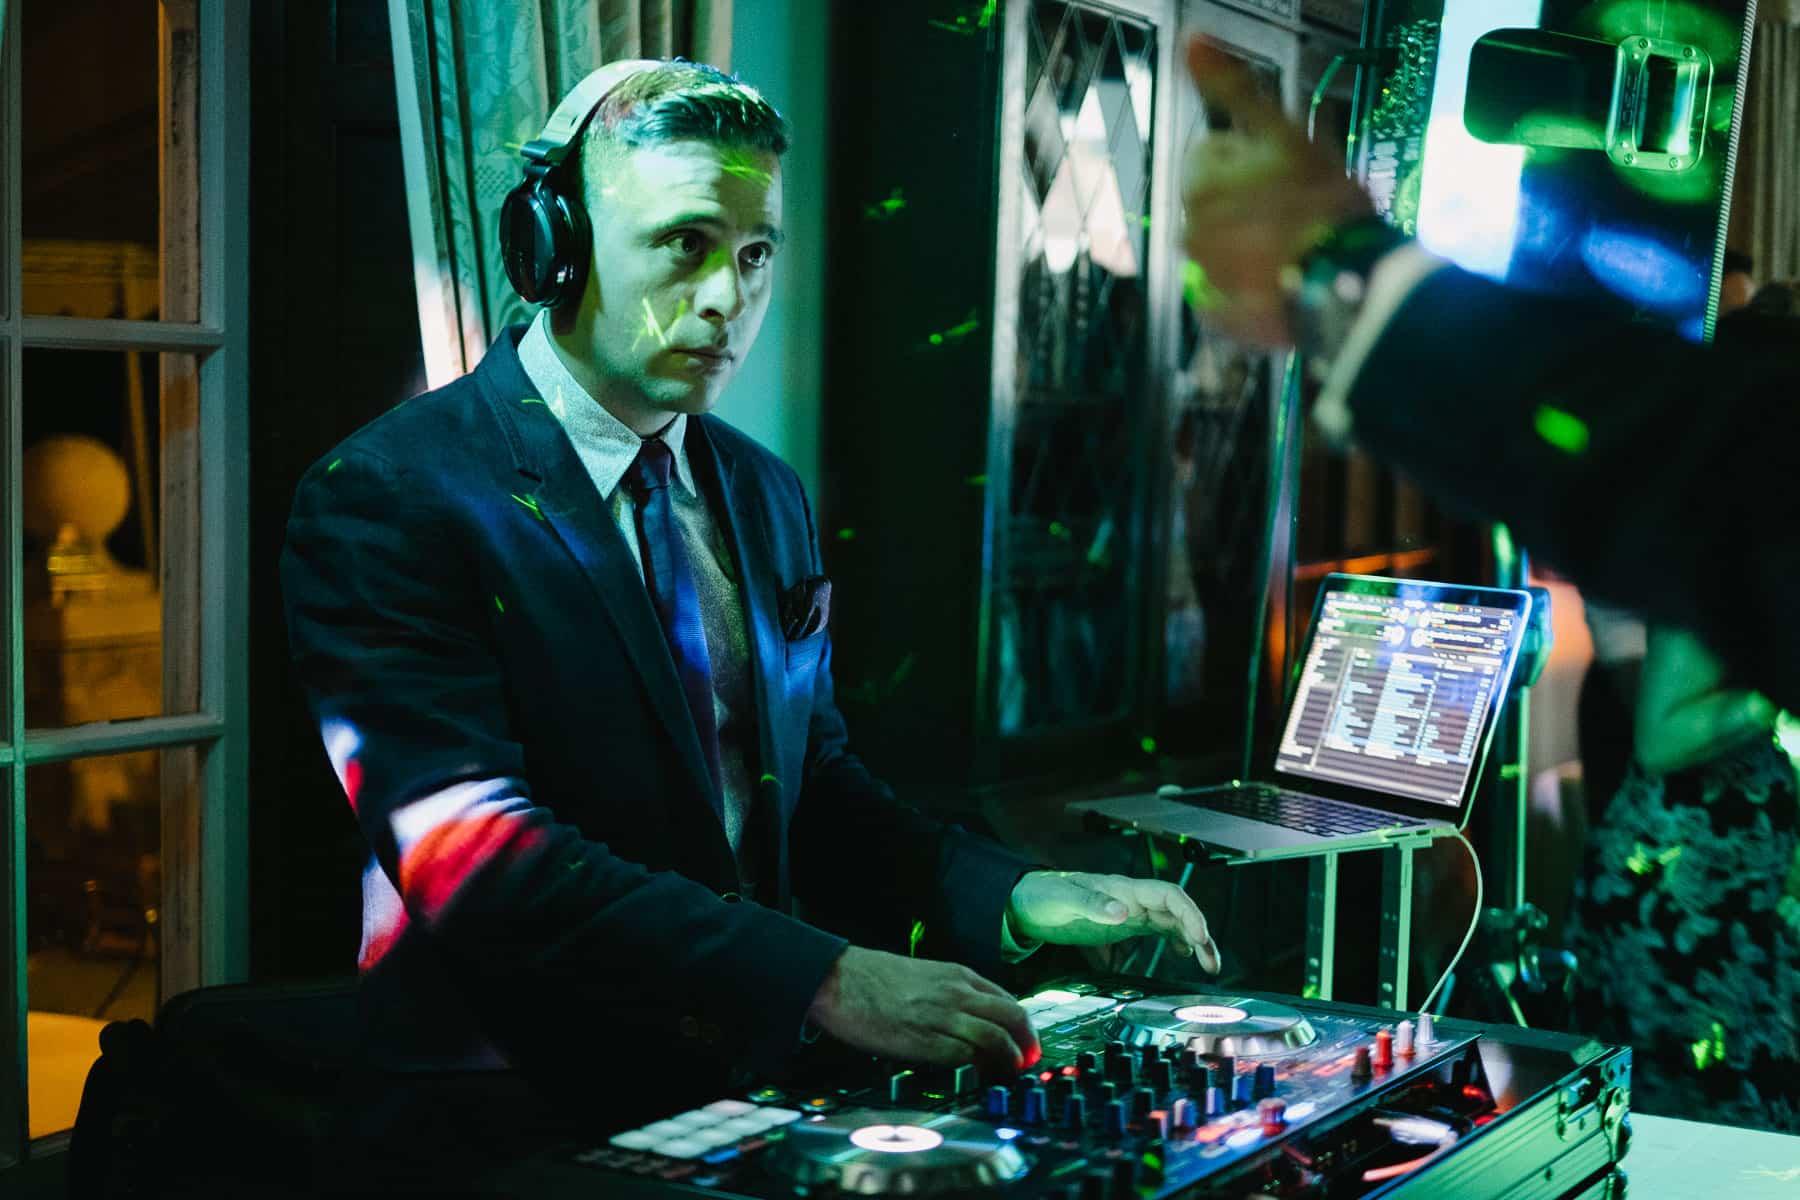 Wedding DJ mixing music in green light at McClain House, Estates of Sunnybrook.